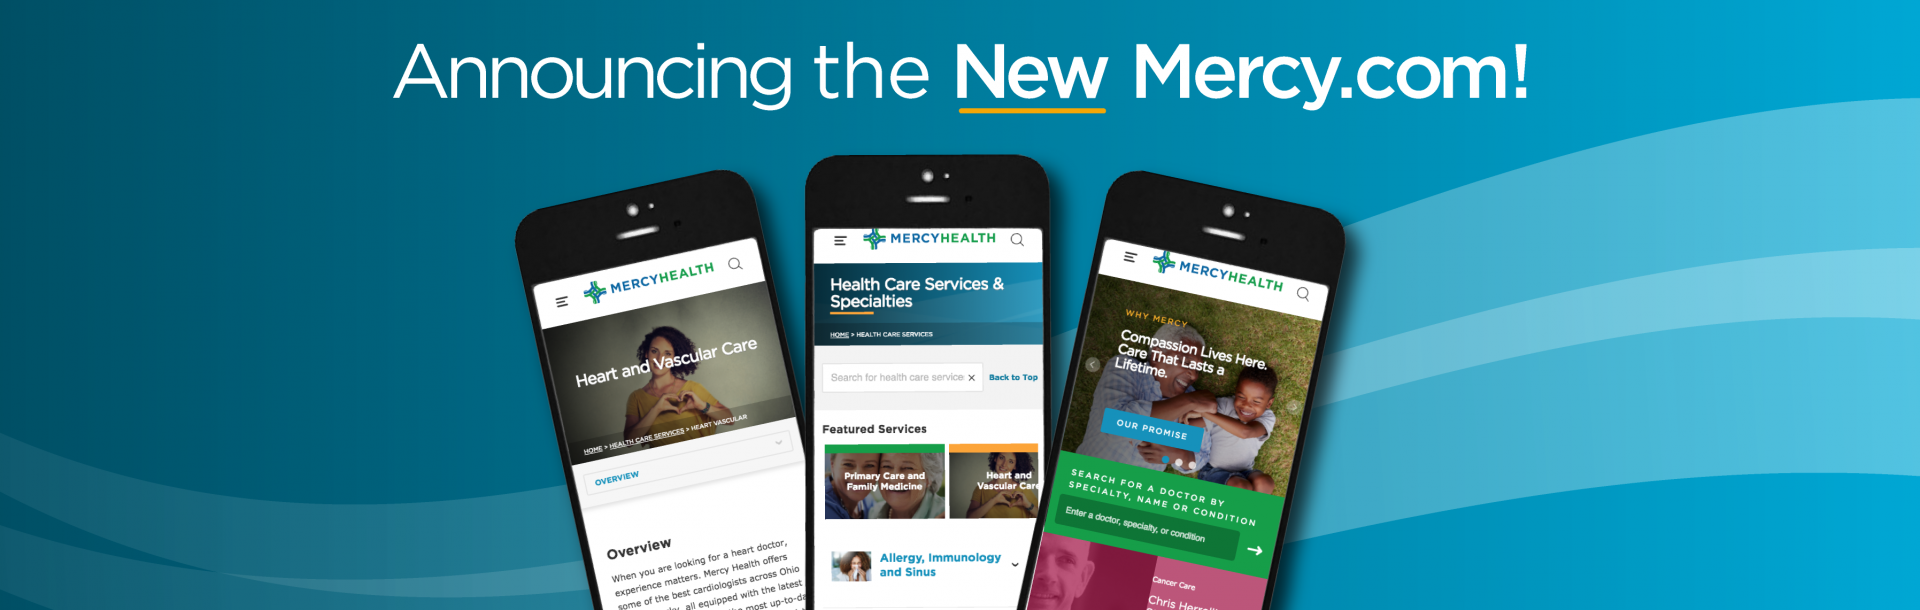 announcement of new mercy health website